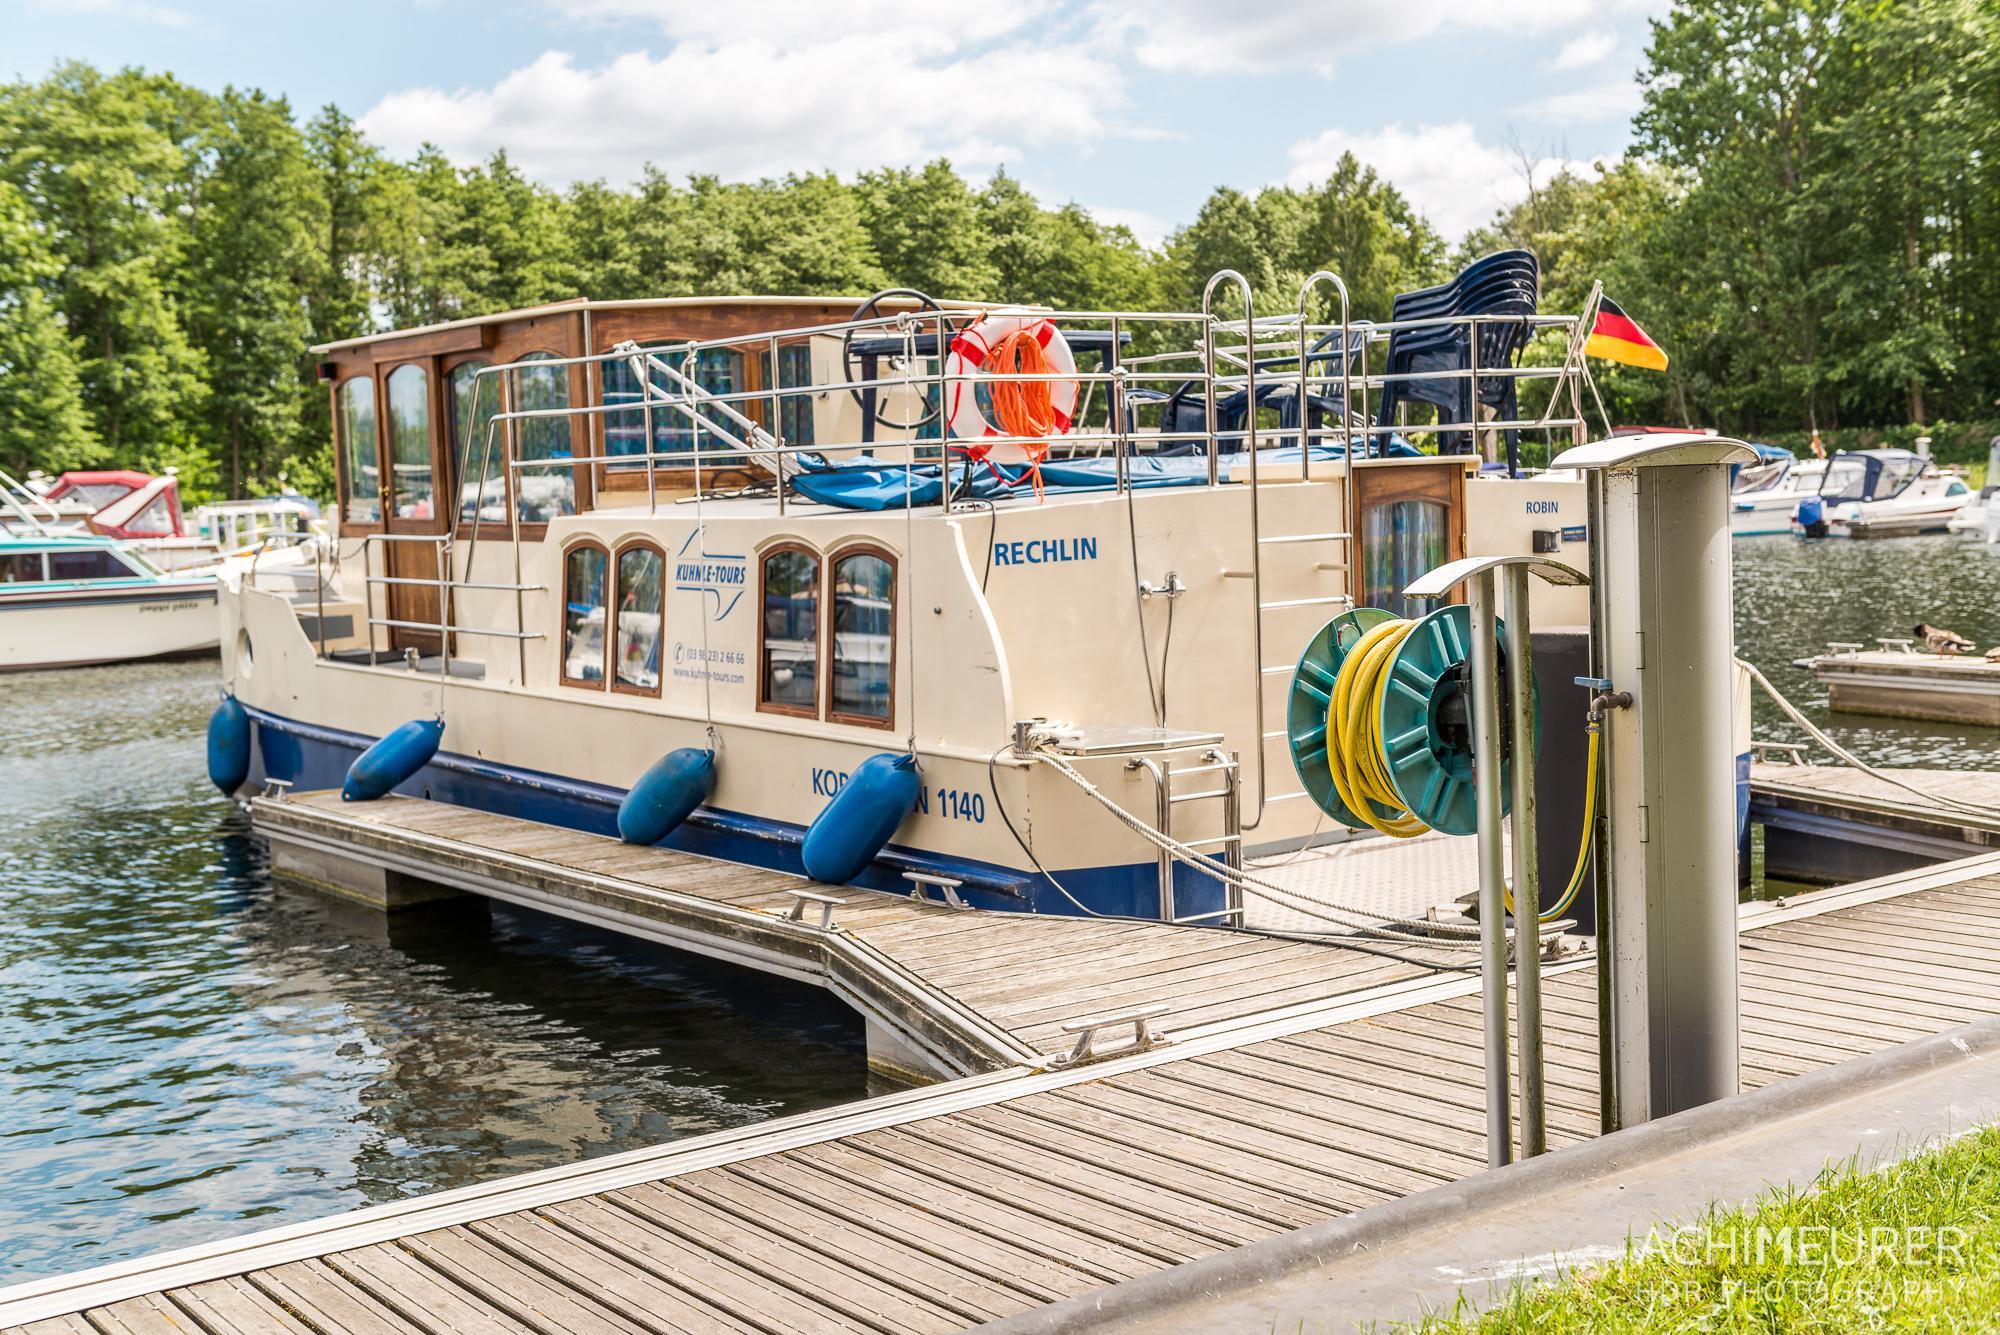 Hausboot-Kuhnle-Mueritz-Mecklenburg-Vorpommern-See_3824